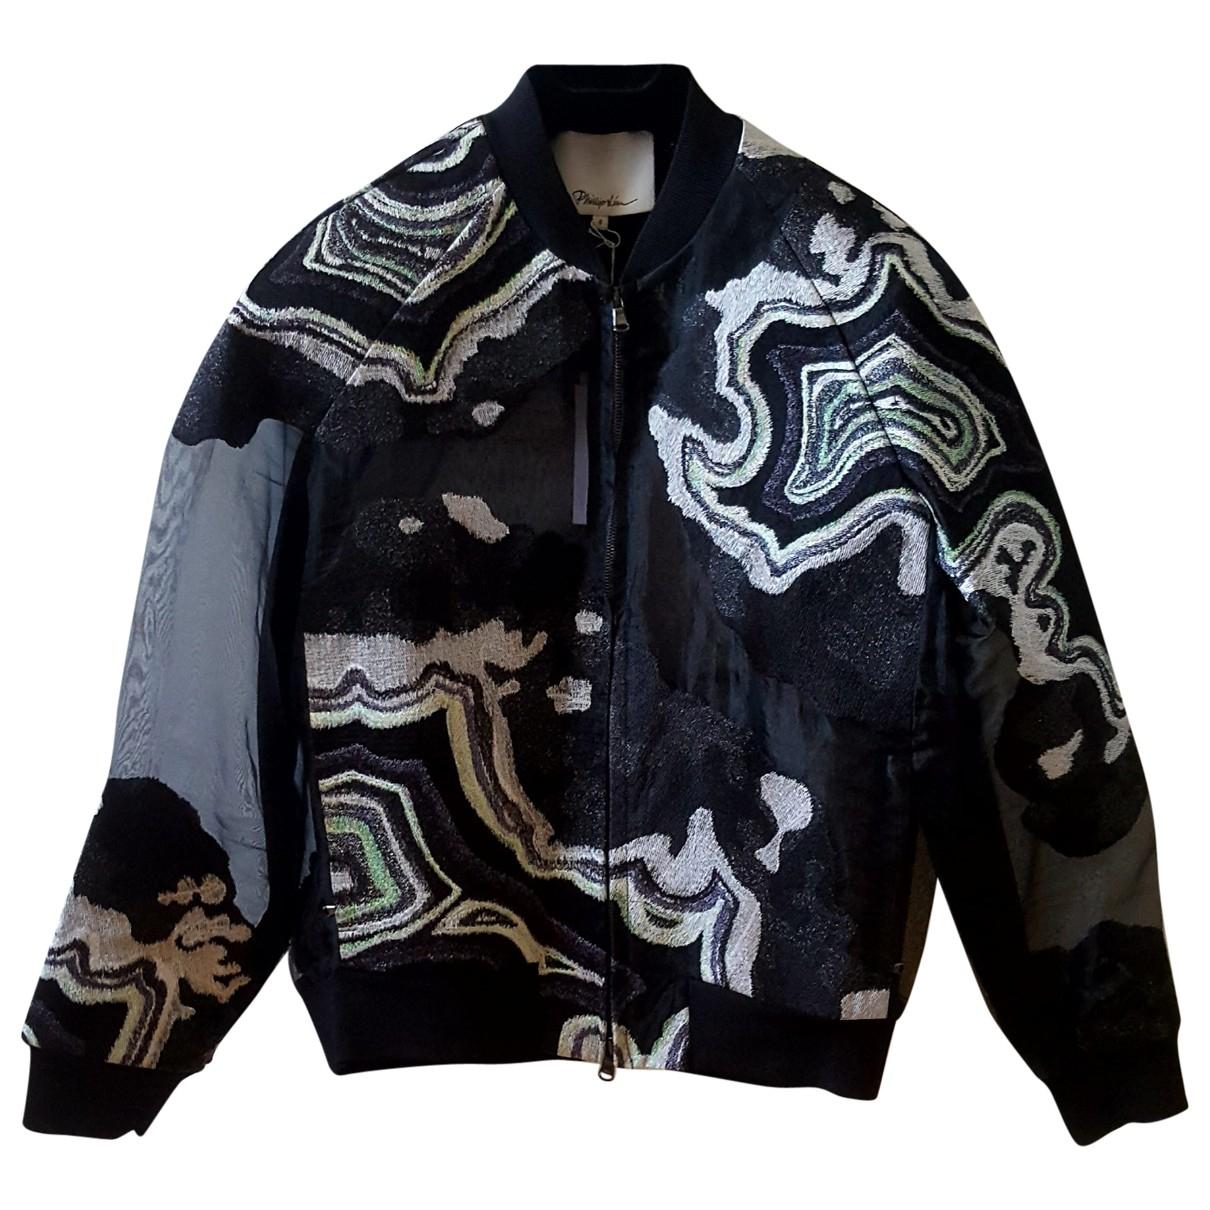 3.1 Phillip Lim \N Black Silk jacket for Women 4 US